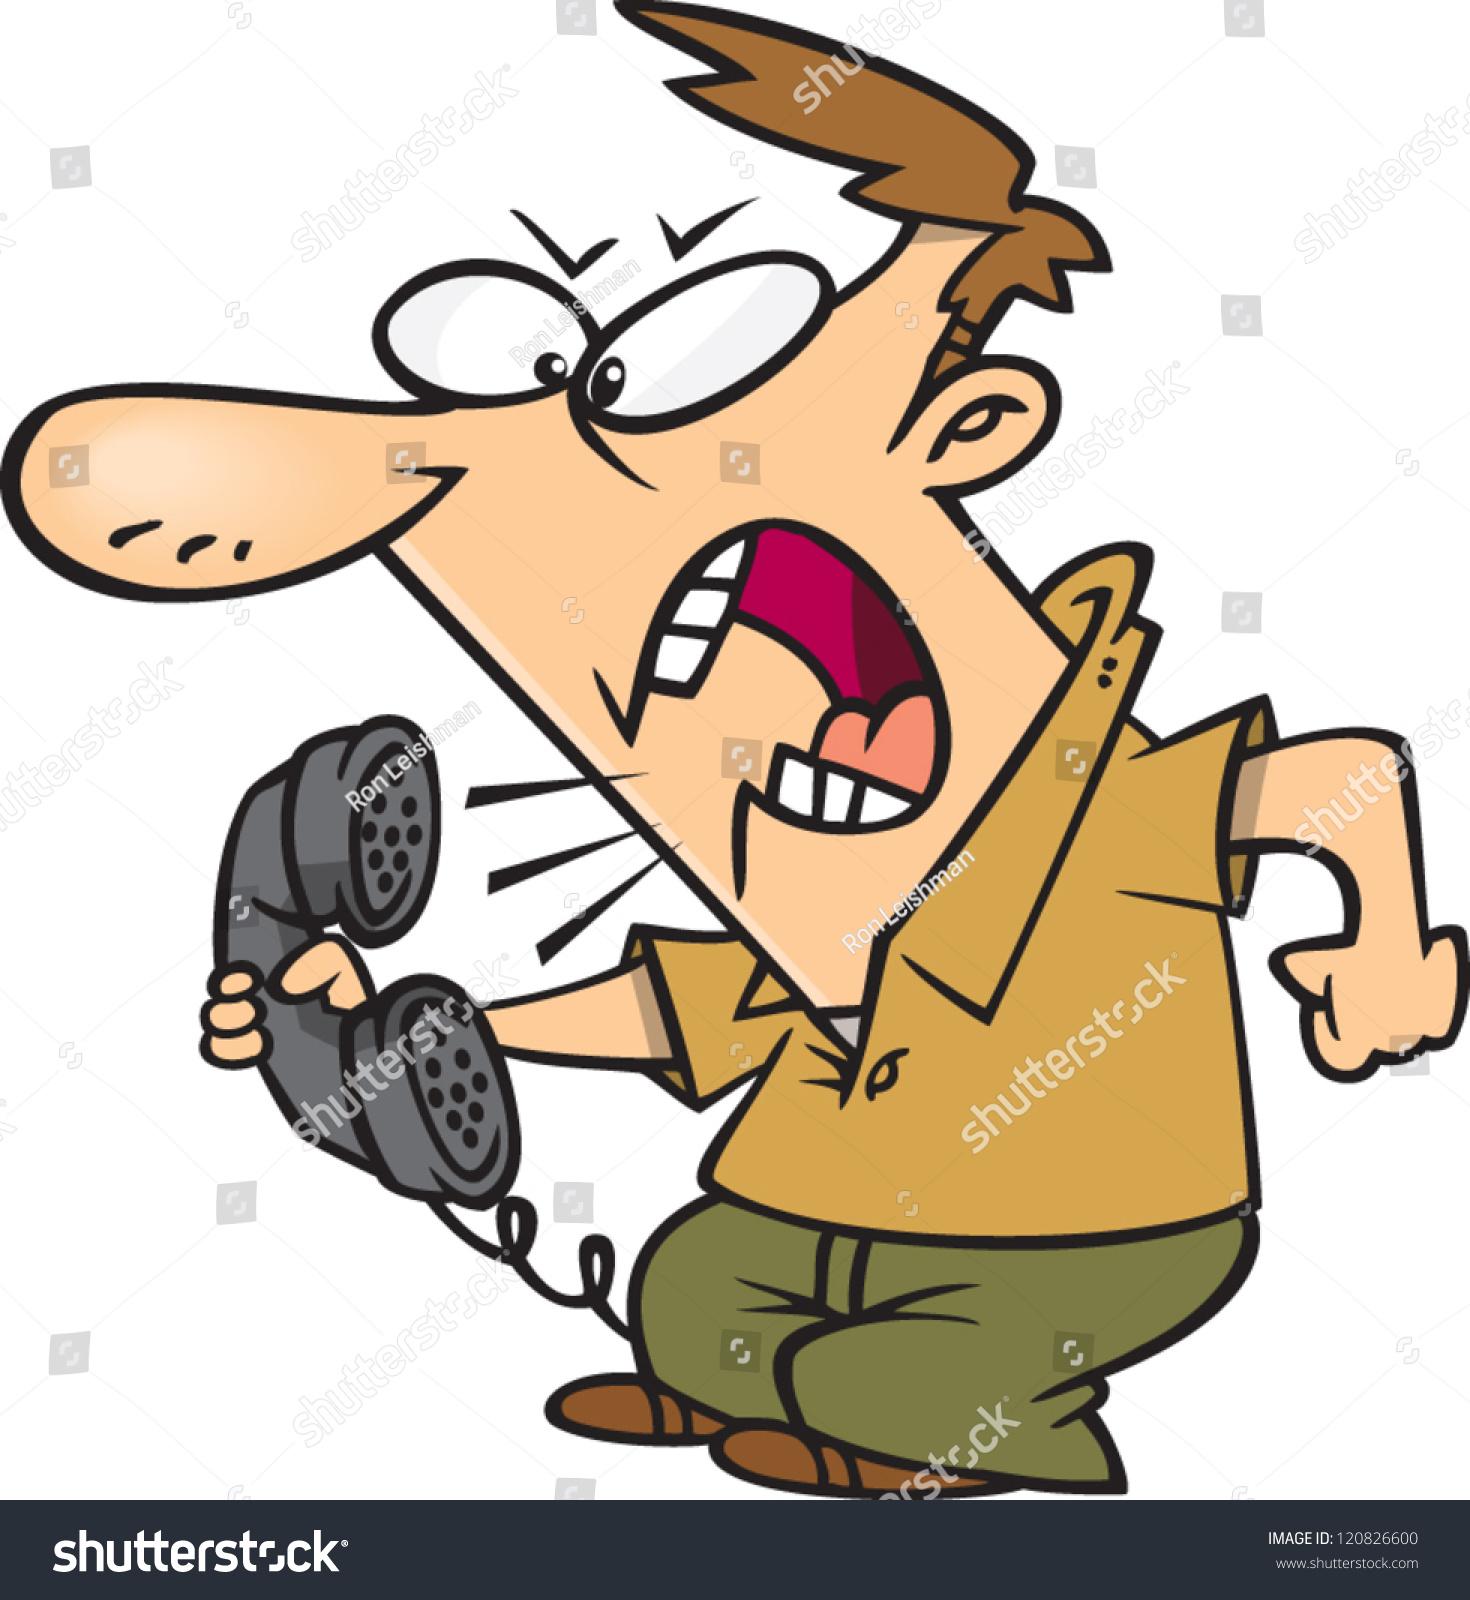 Angry Cartoon Man Yelling Into Phone Stock Vector ...